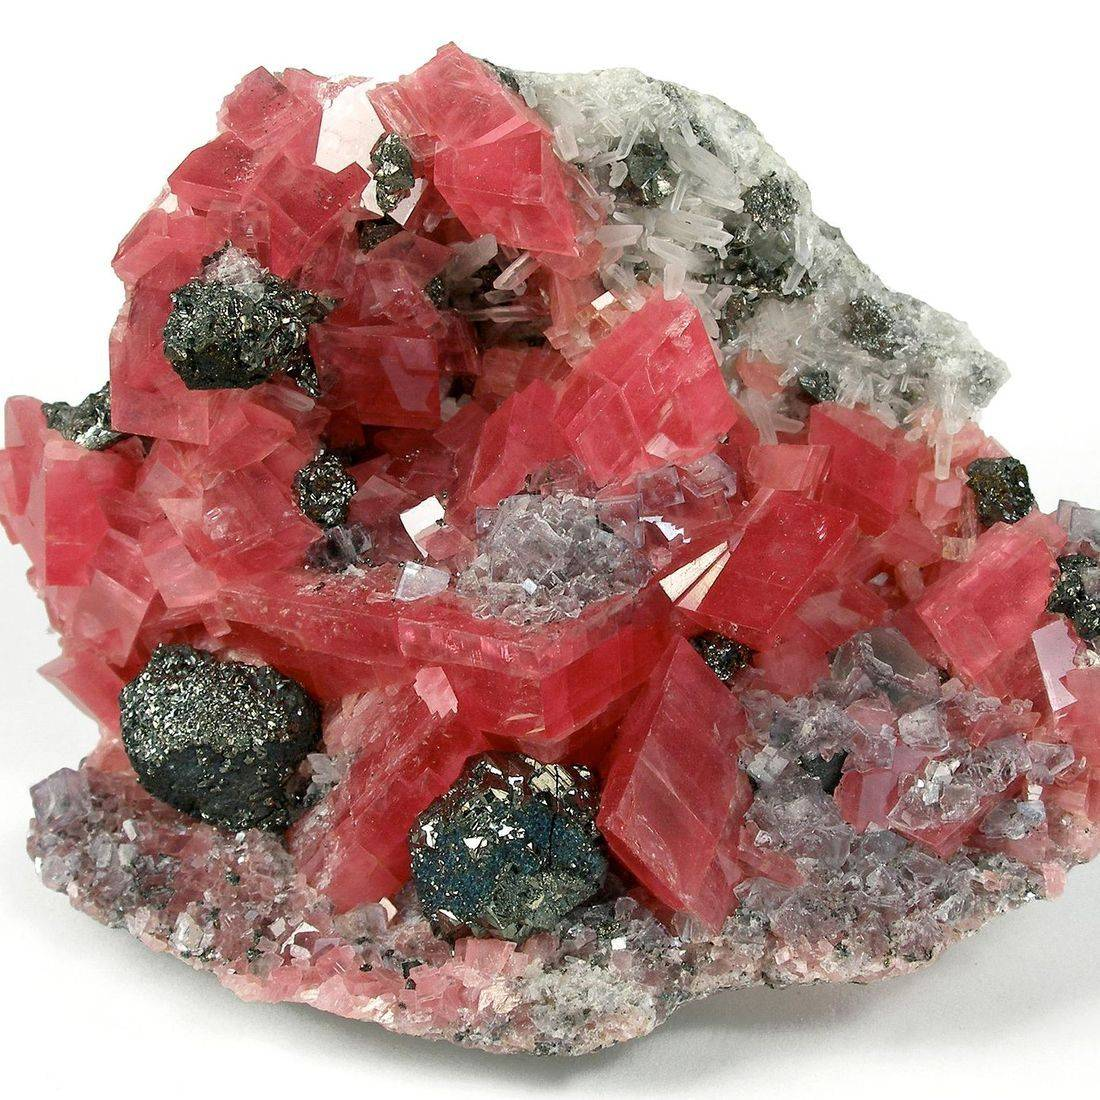 Rhodochrosite and pyrite with quartz